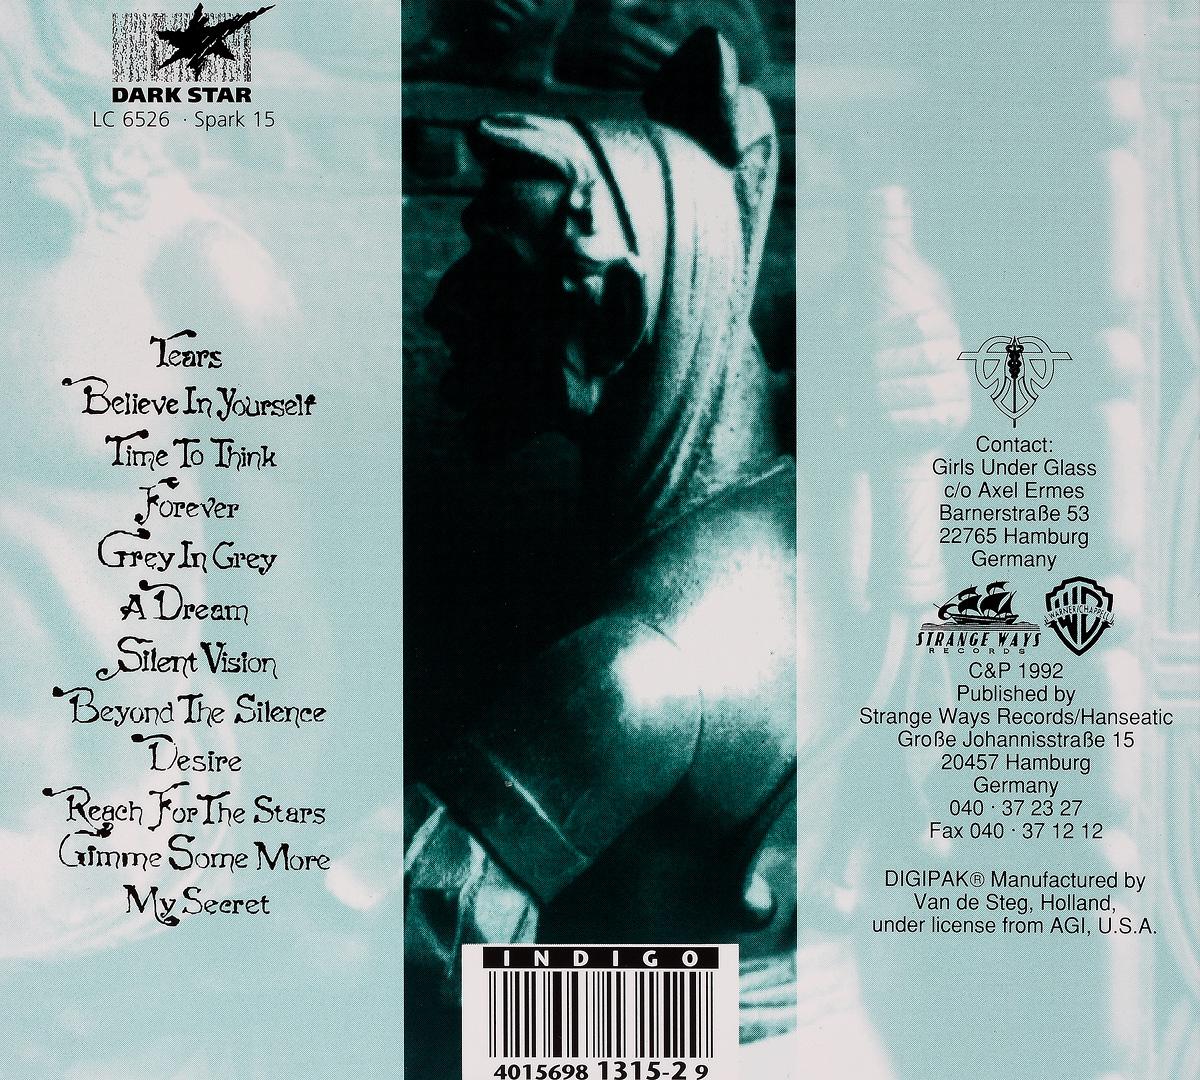 Girls Under Glass.  Darius Strange Ways Records,Волтэкс-инвест